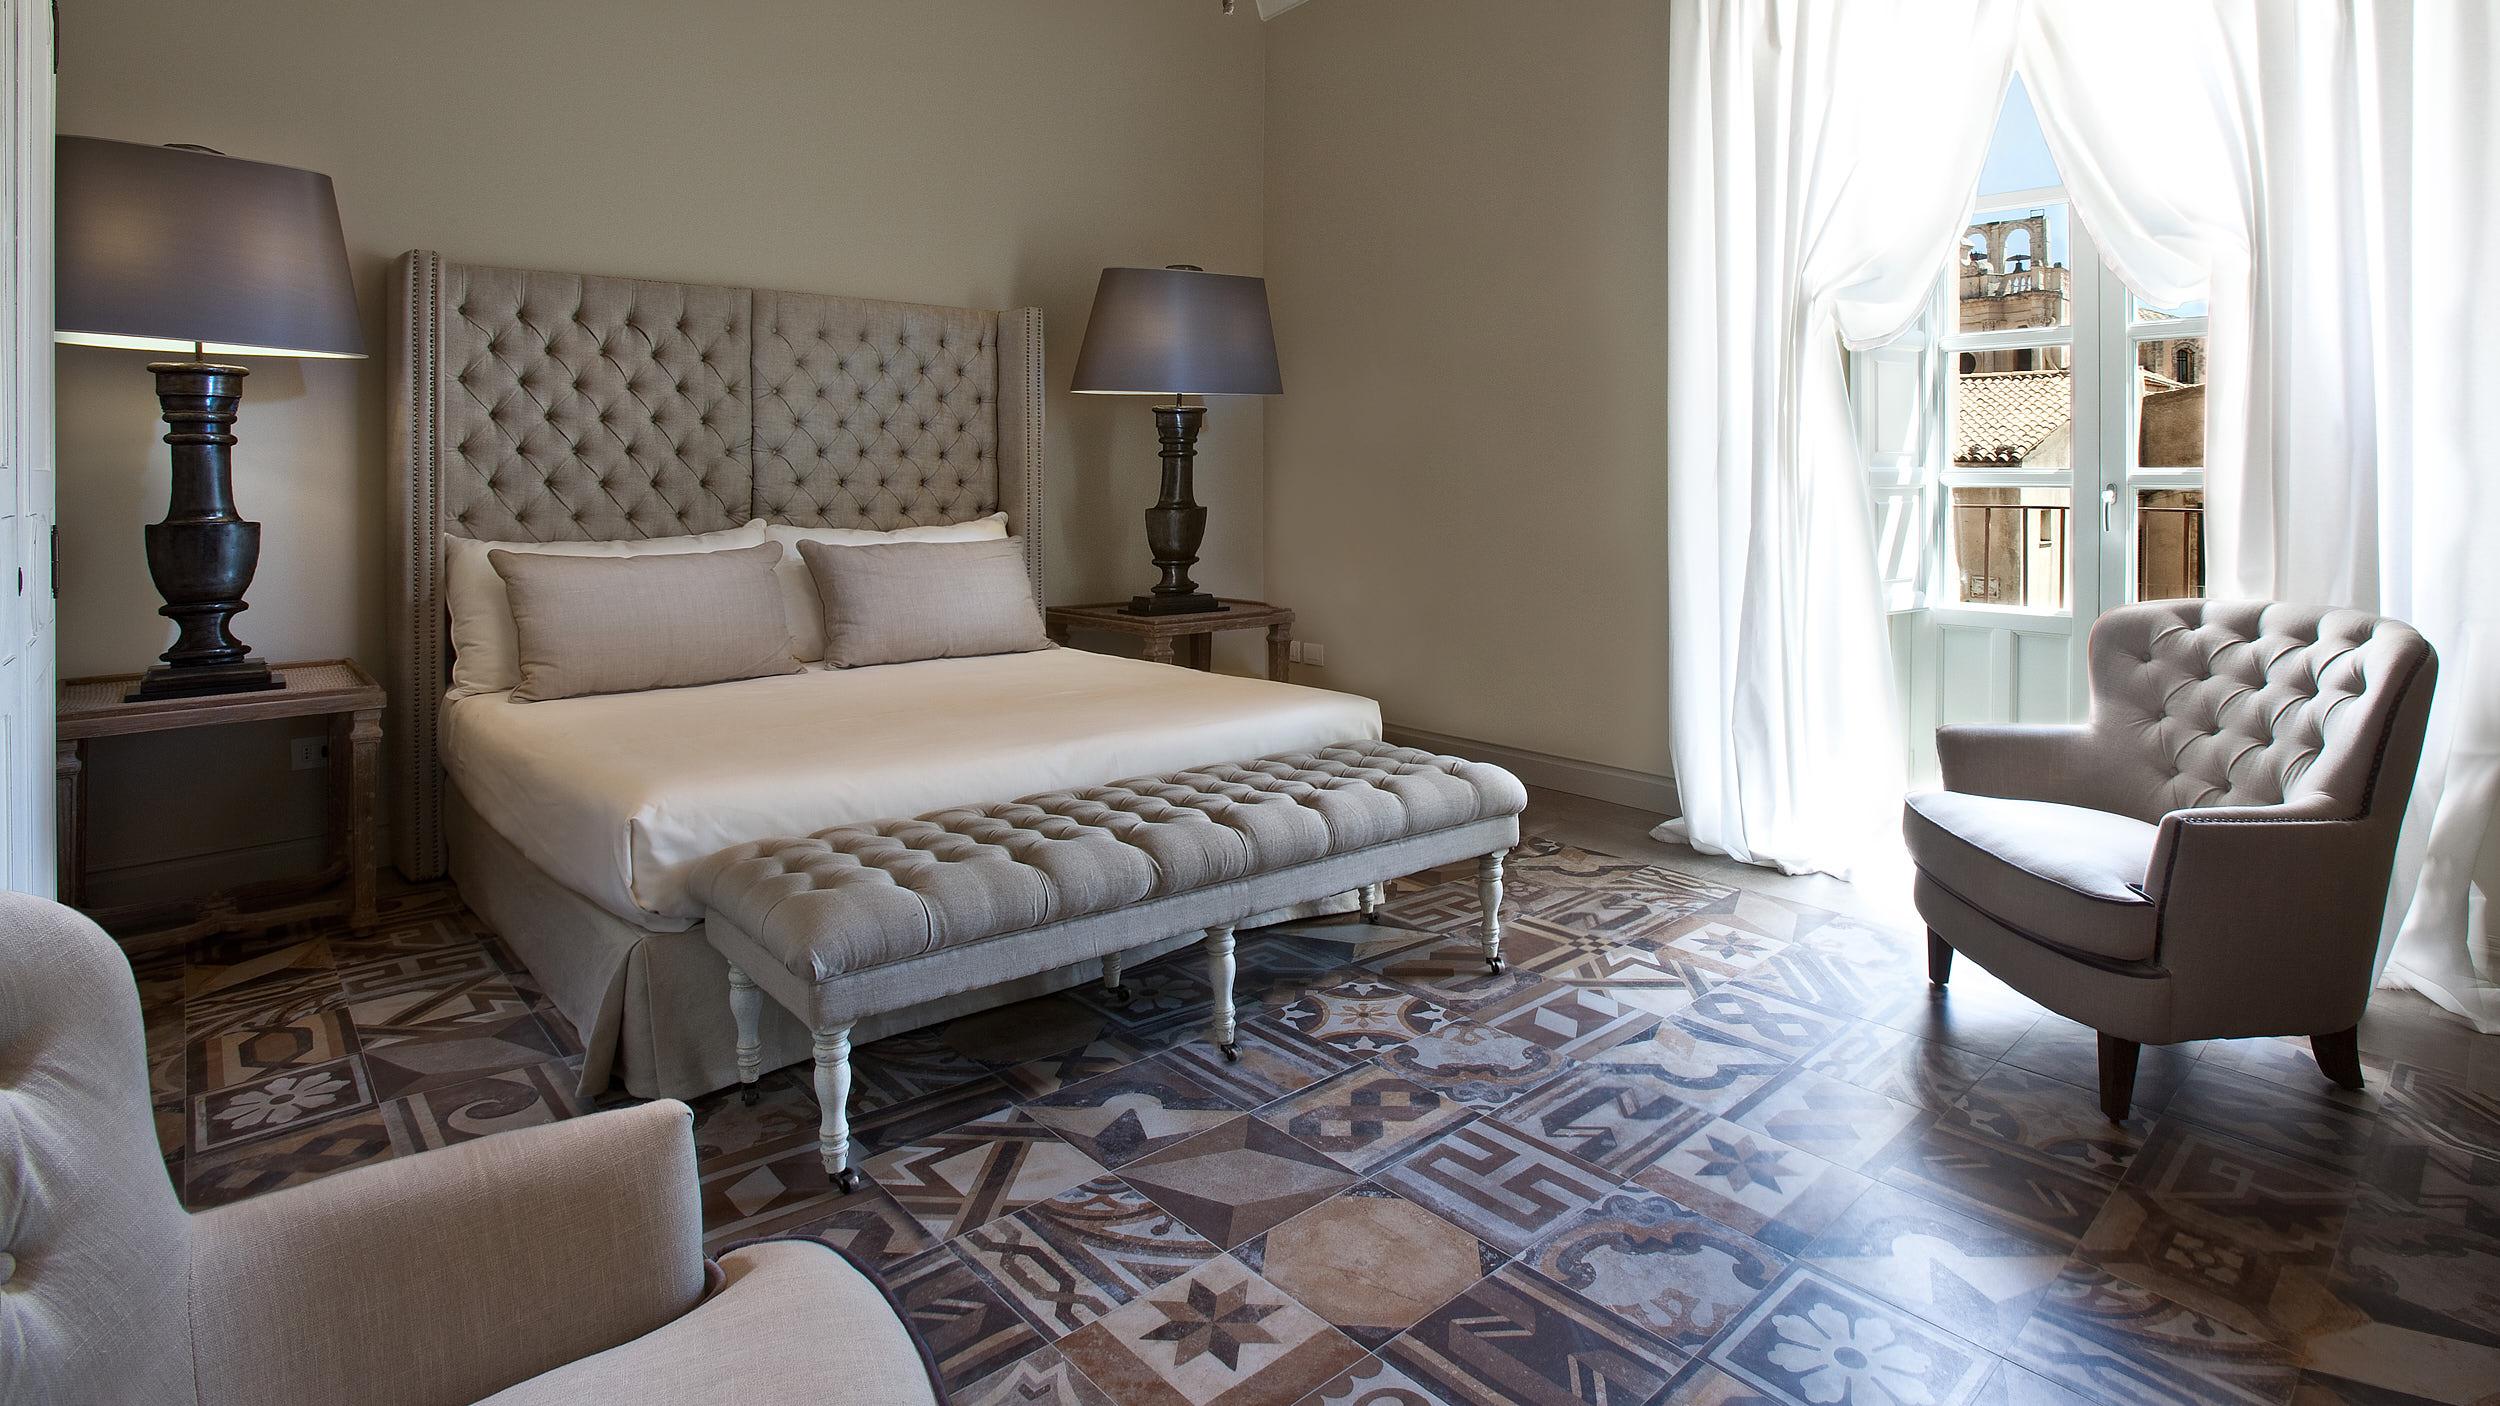 Baroque Splendor in Noto: Seven Rooms Villadorata on Perfect Local Day by UNCOVR Travel